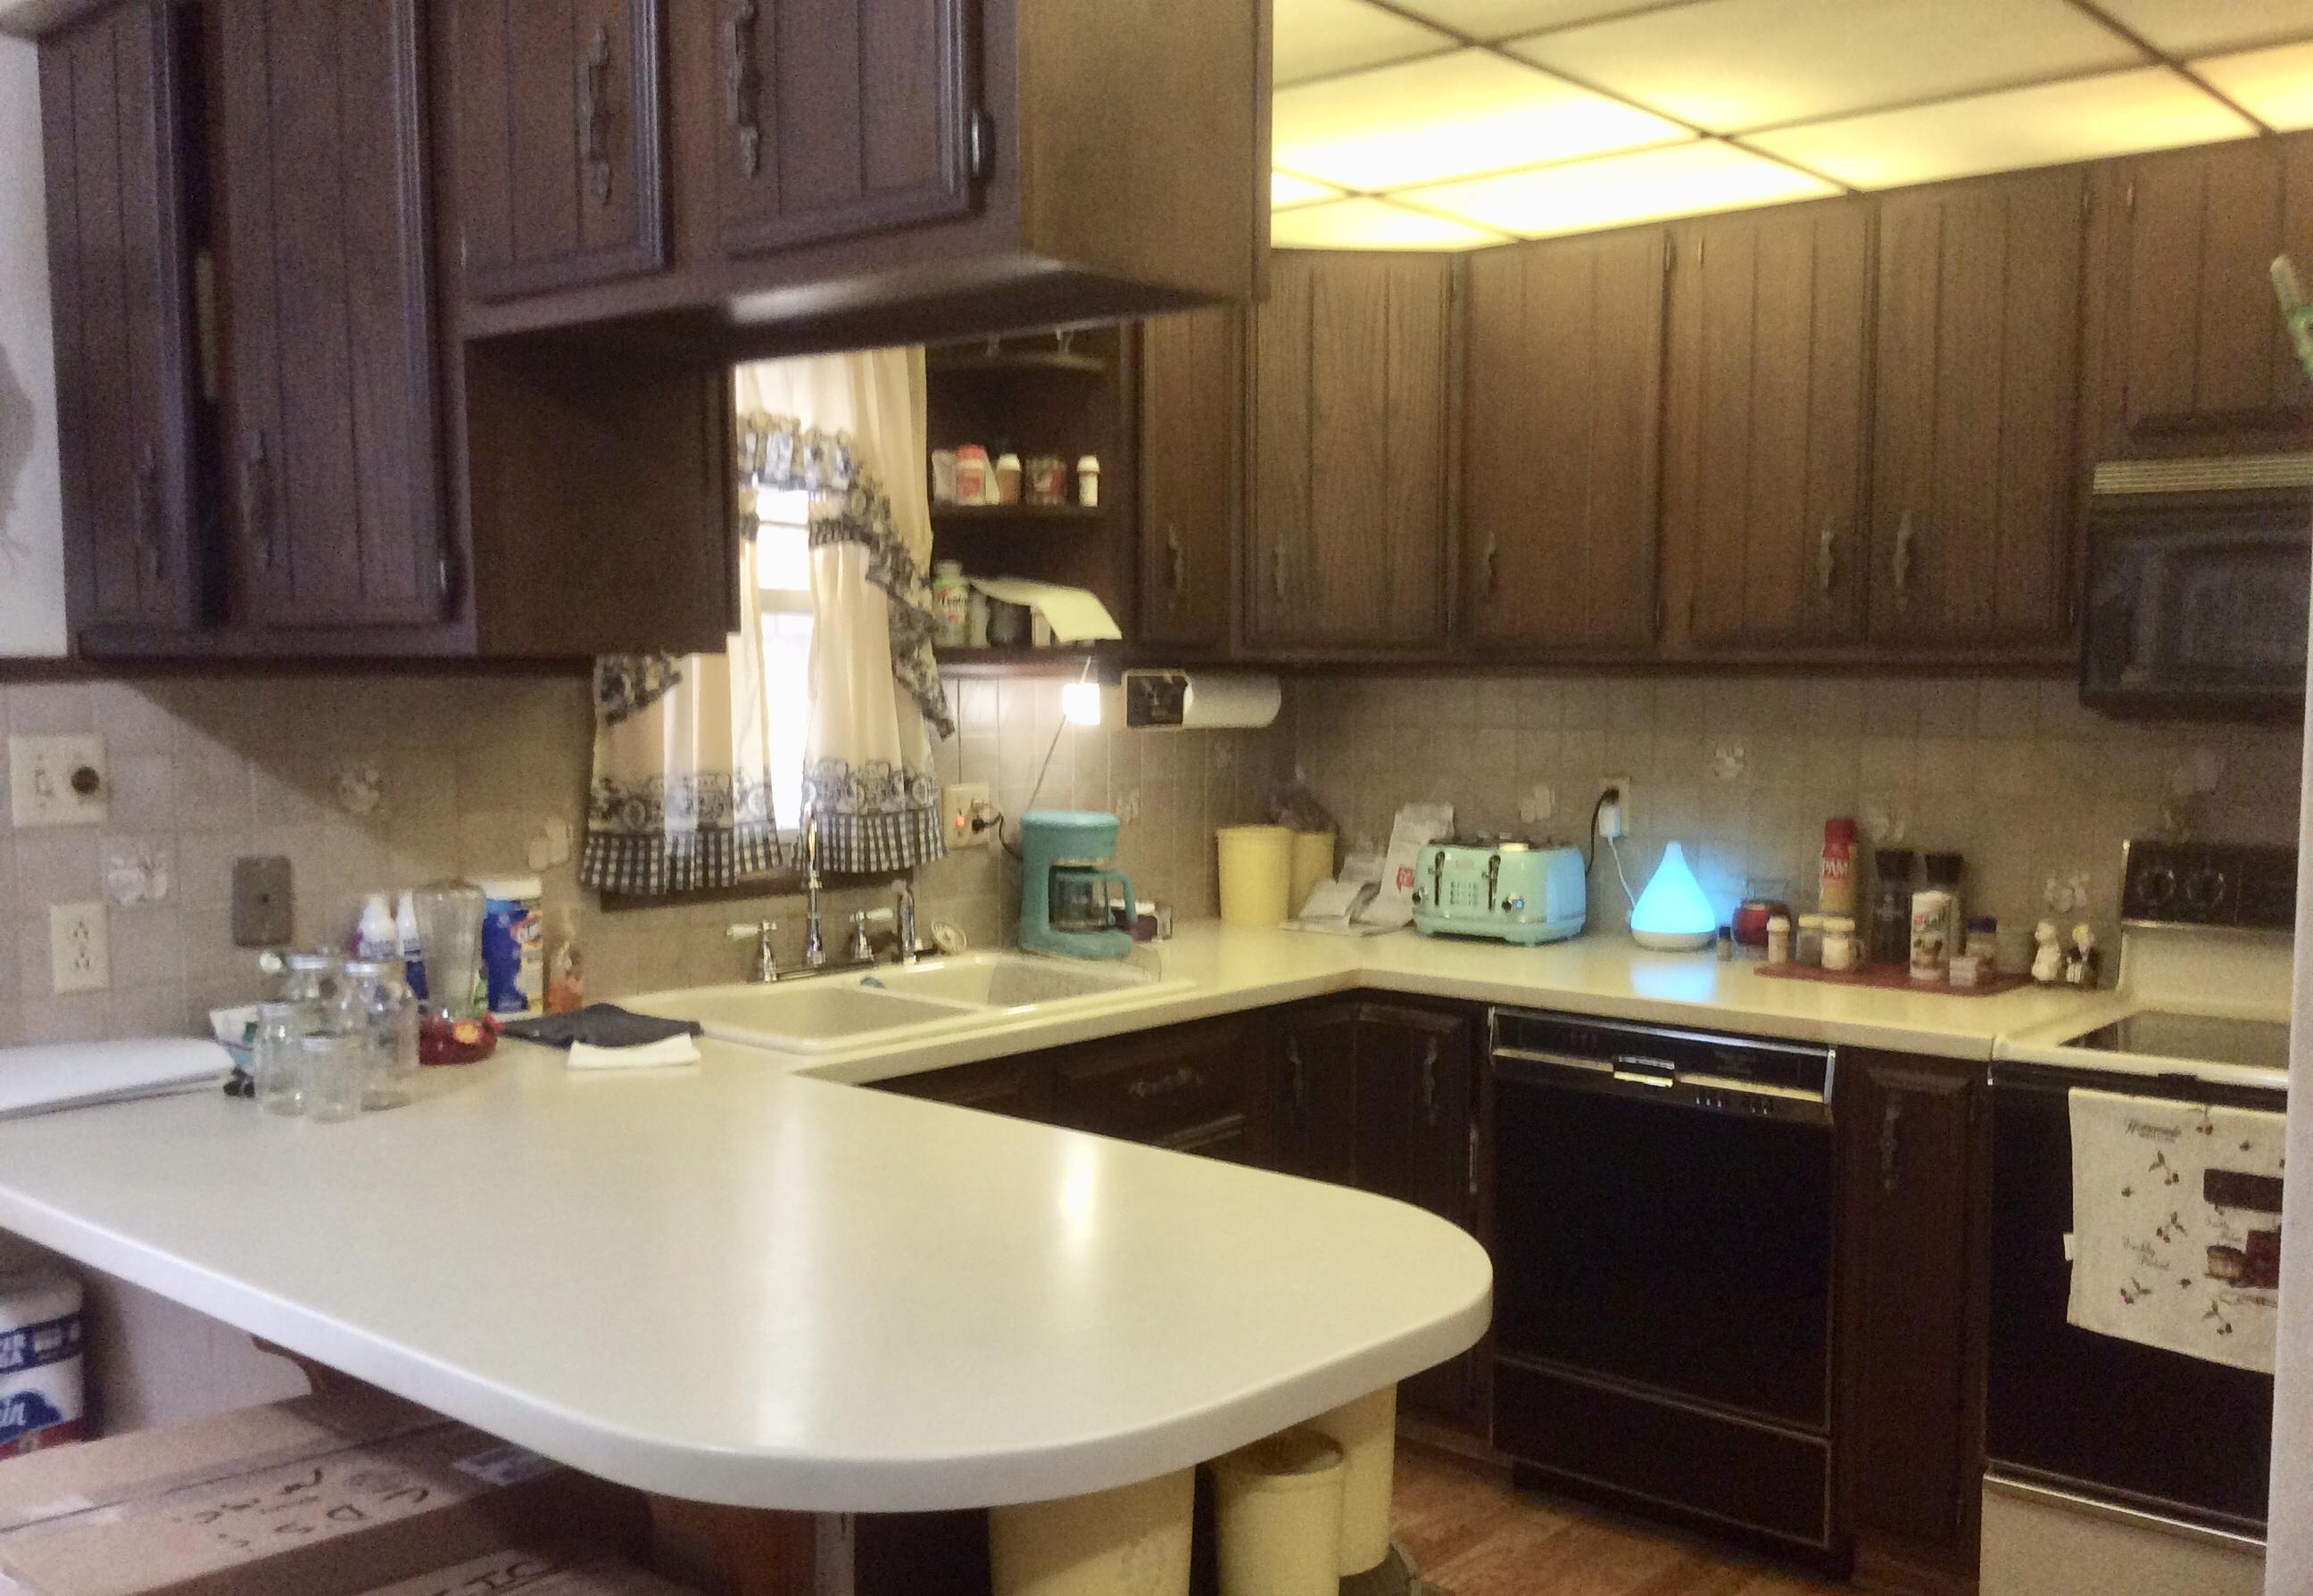 Open kitchen has Corian countertops